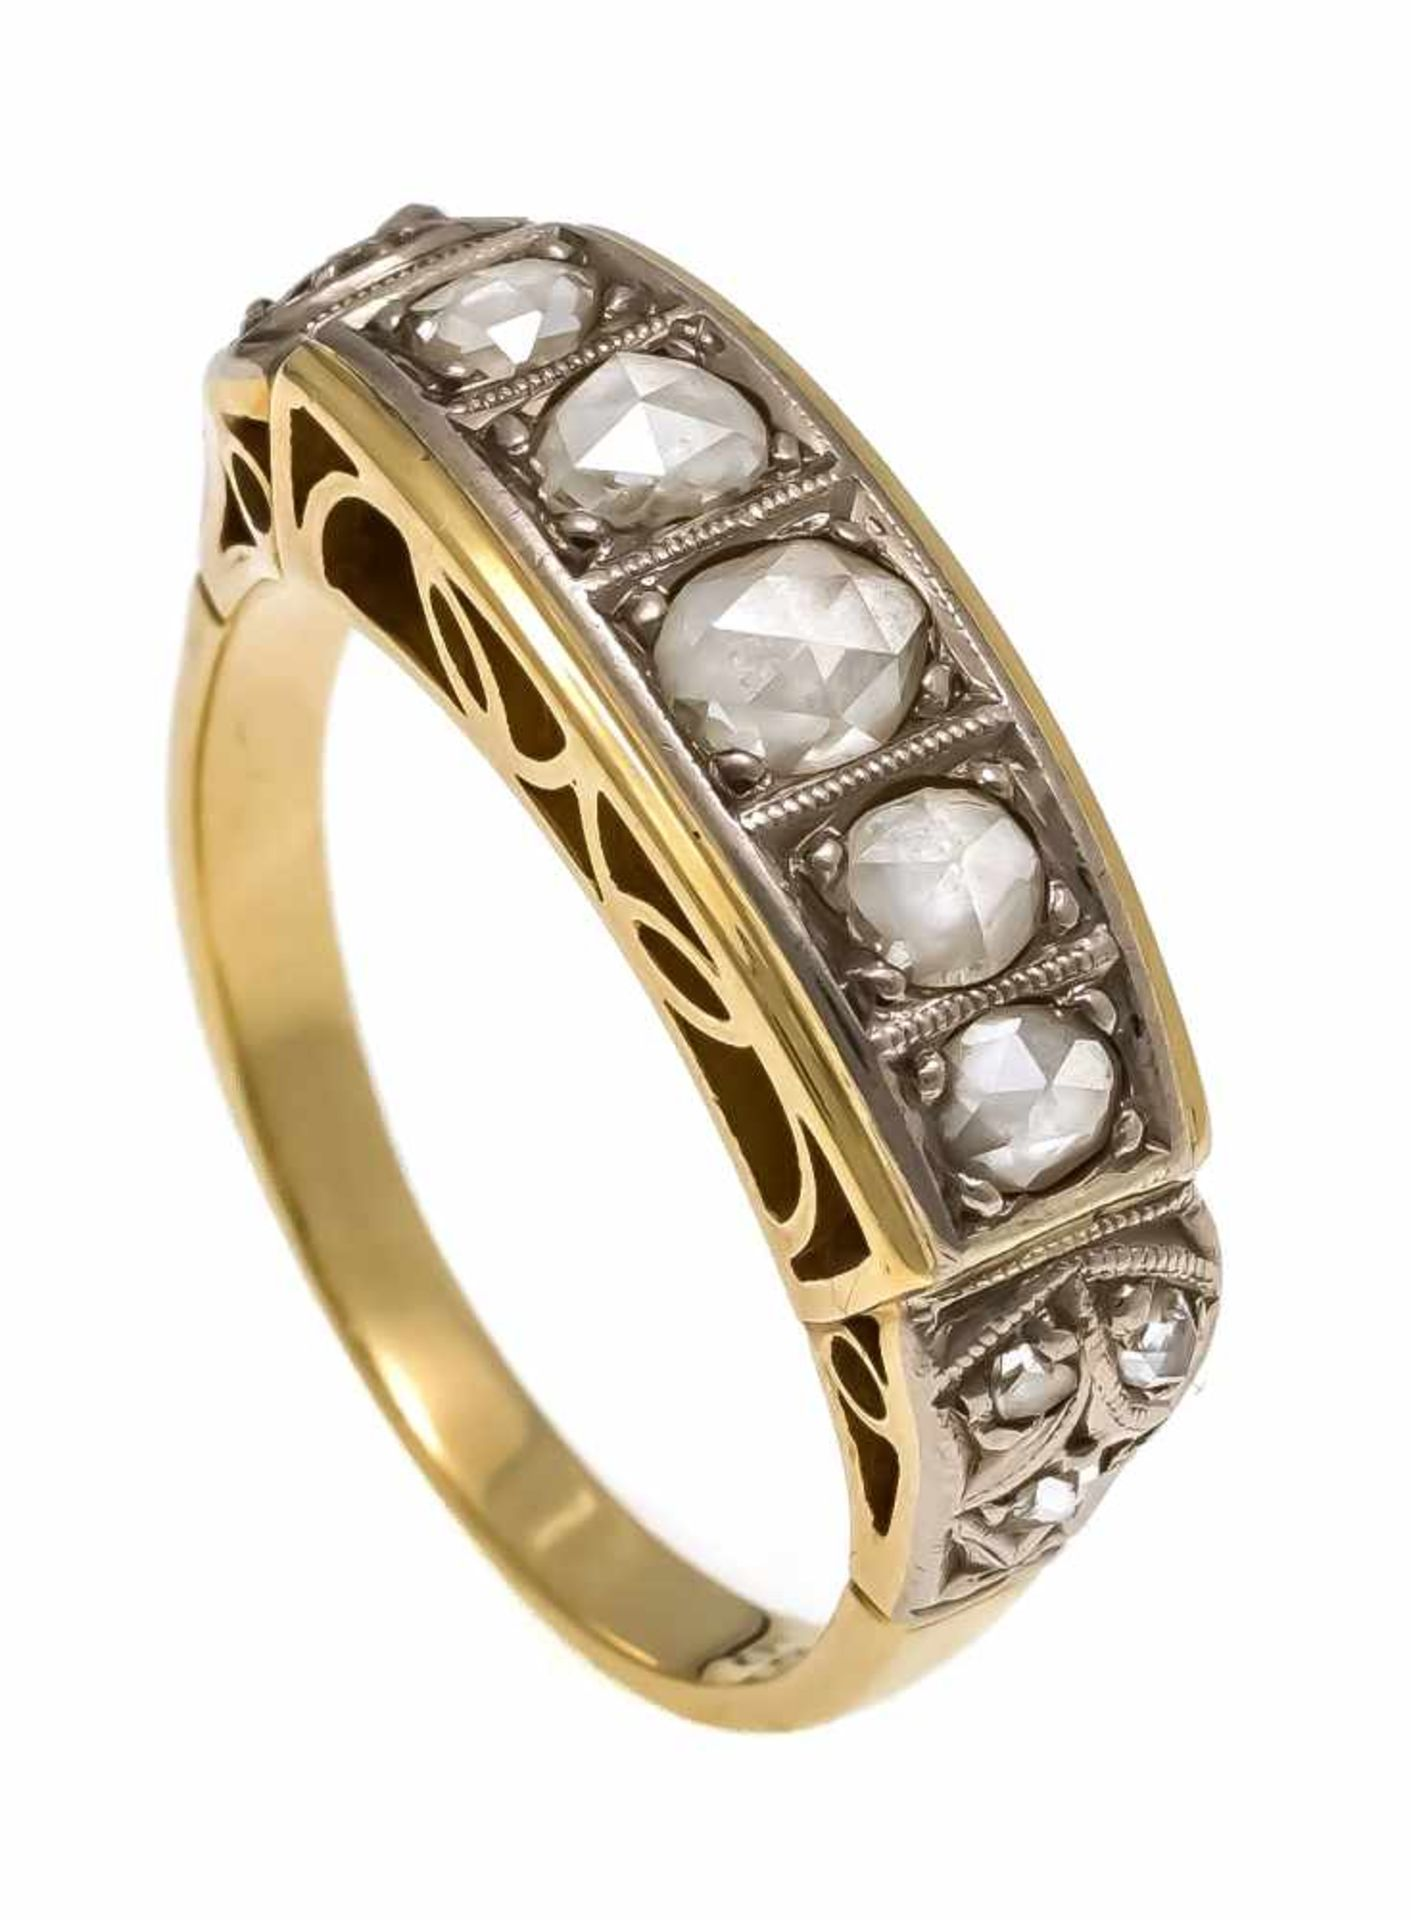 Diamantrosen-Ring GG/WG 585/000 mit 10 Diamantrosen 5 - 1,5 mm (1x fehlt), RG 55, 4,5 gDiamond